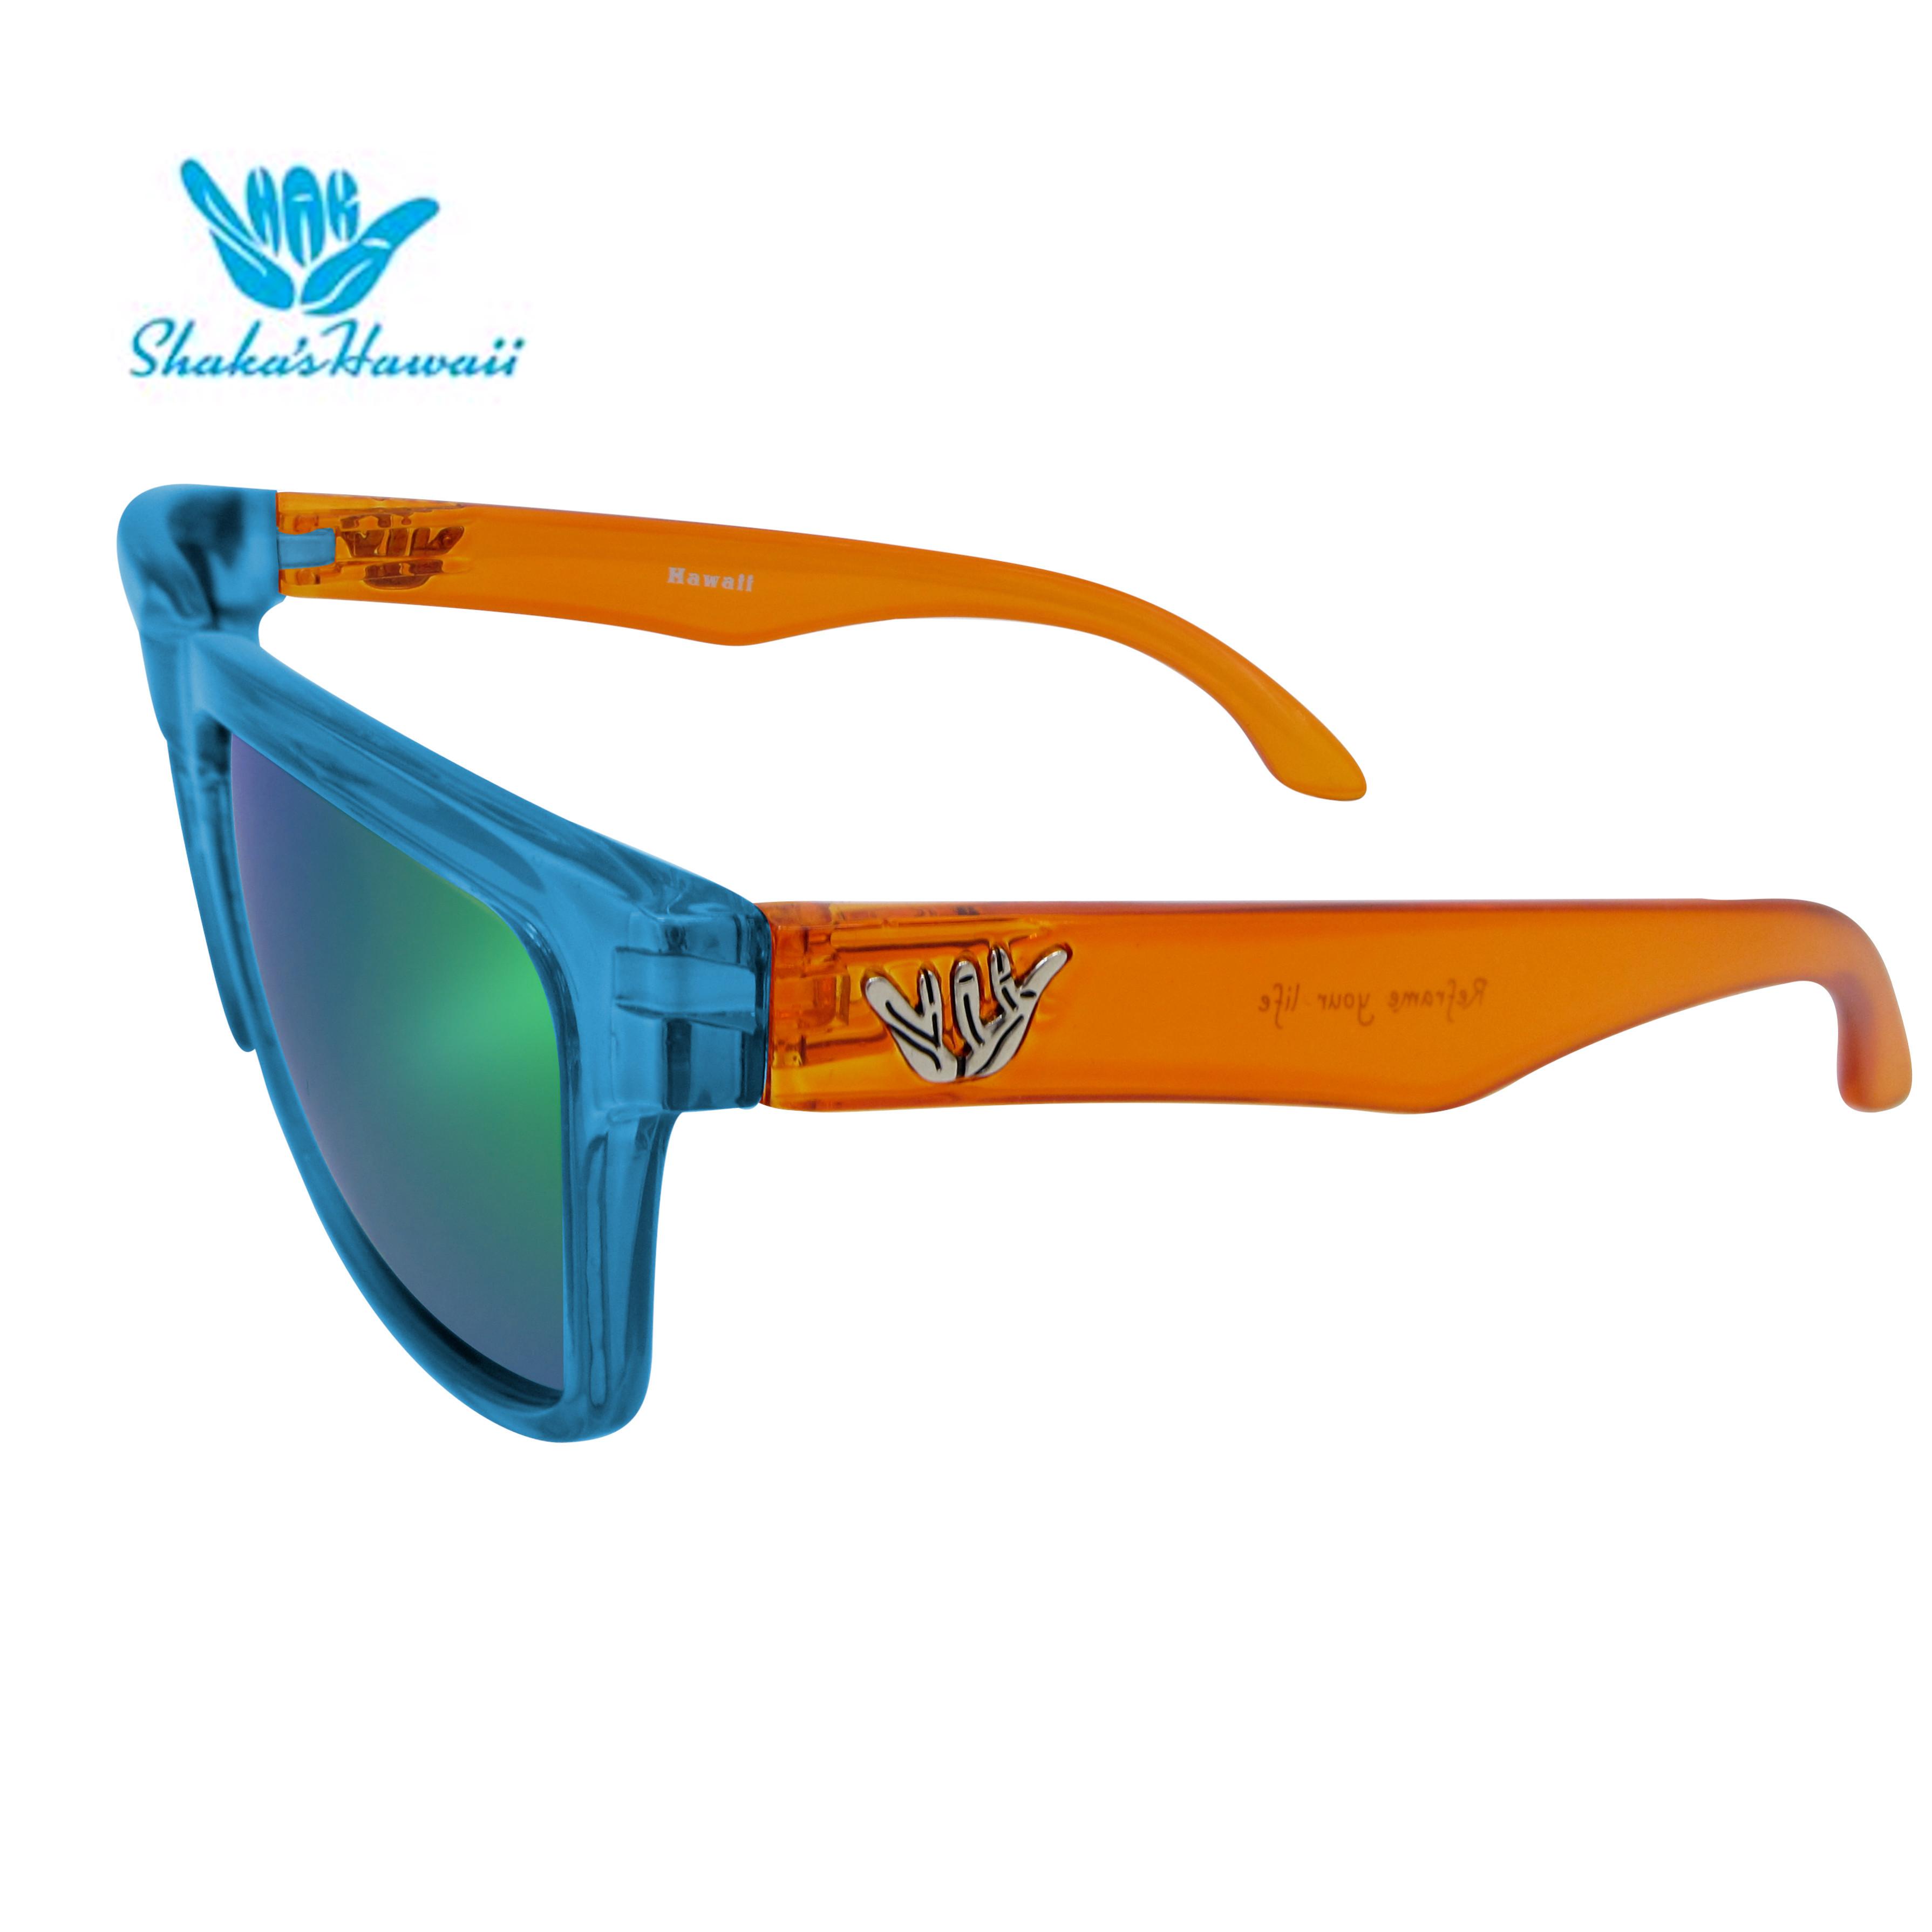 Bruno(ブルーノ)クリアブルー(レンズグリーン、つるクリアオレンジShaka's Hawaii Sunglasses(シャカサングラス)